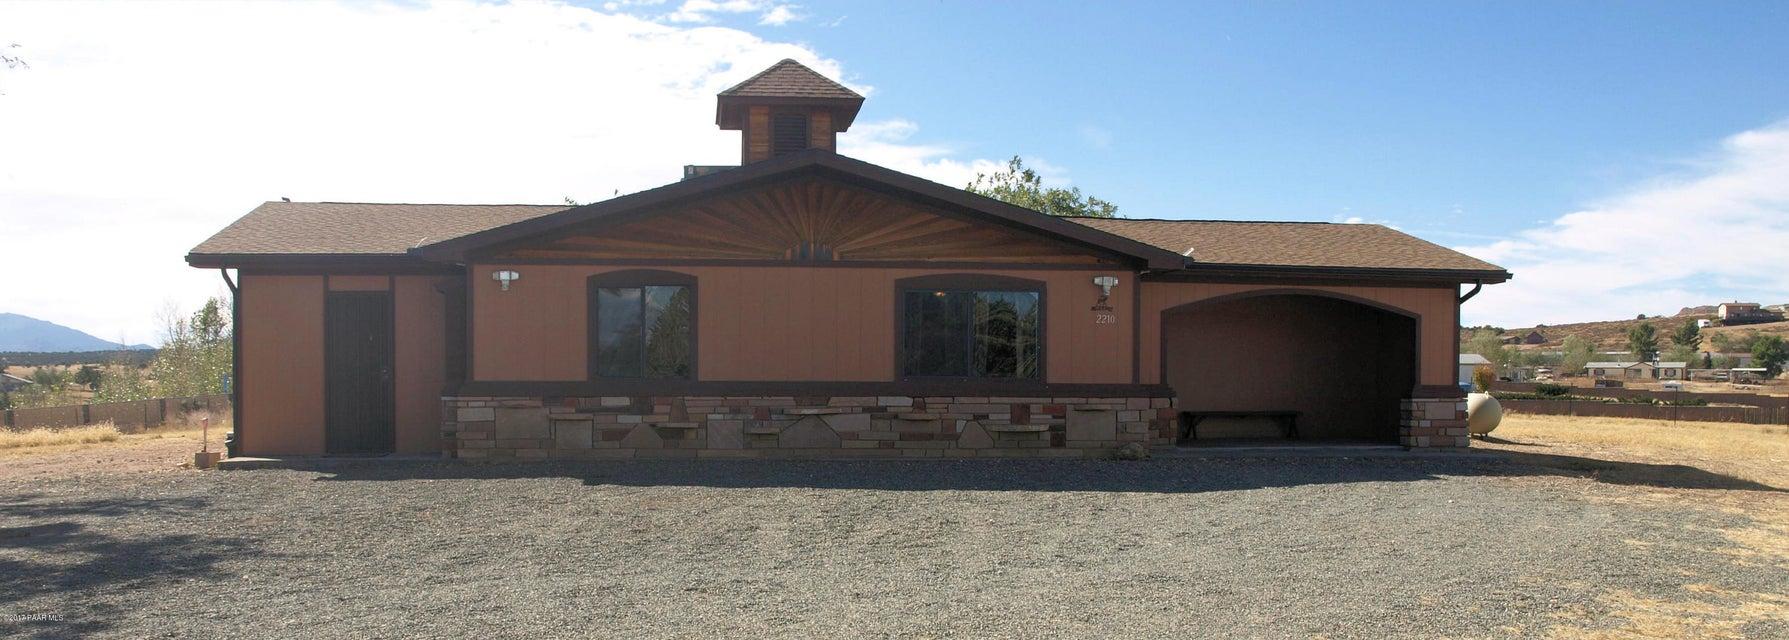 2210 N Apache Drive Chino Valley, AZ 86323 - MLS #: 1007959